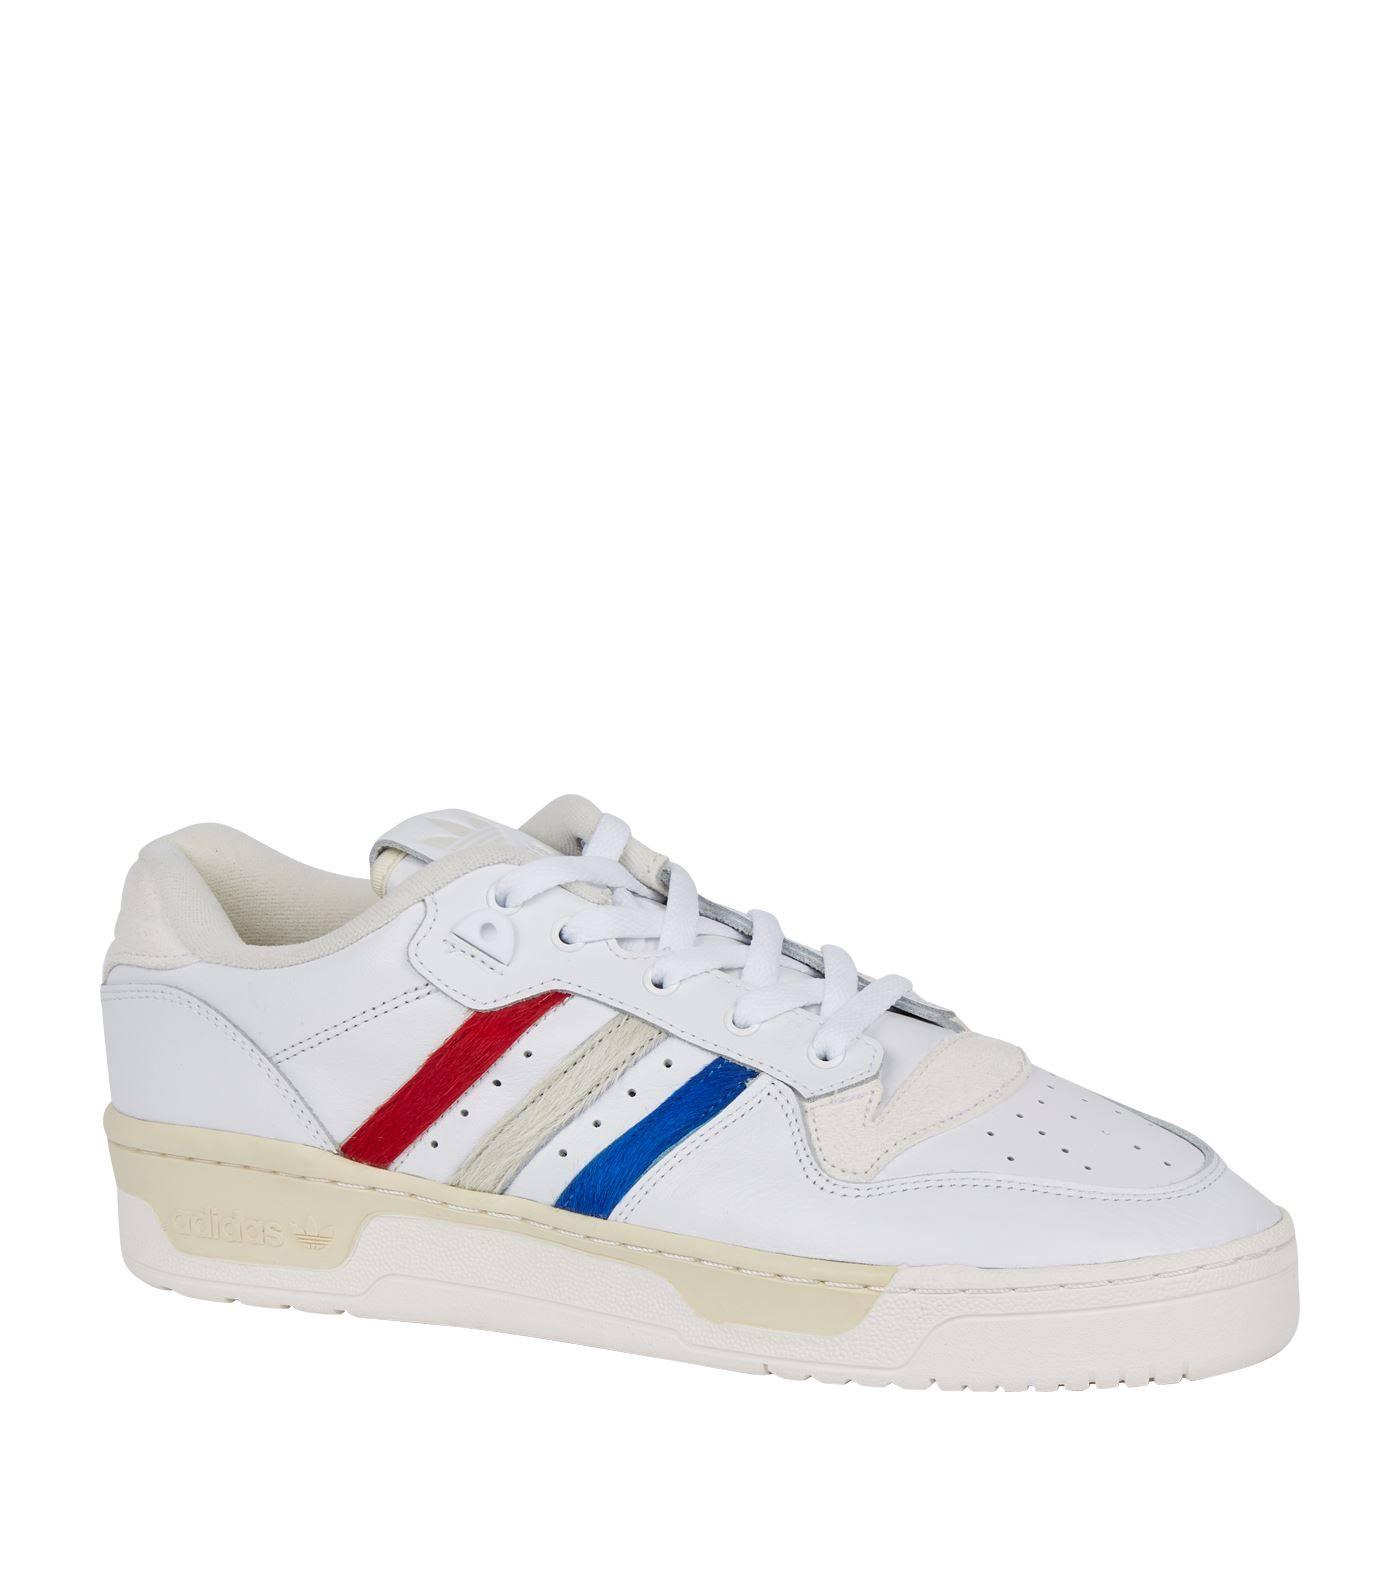 Adidas Originals Rivalry Low White